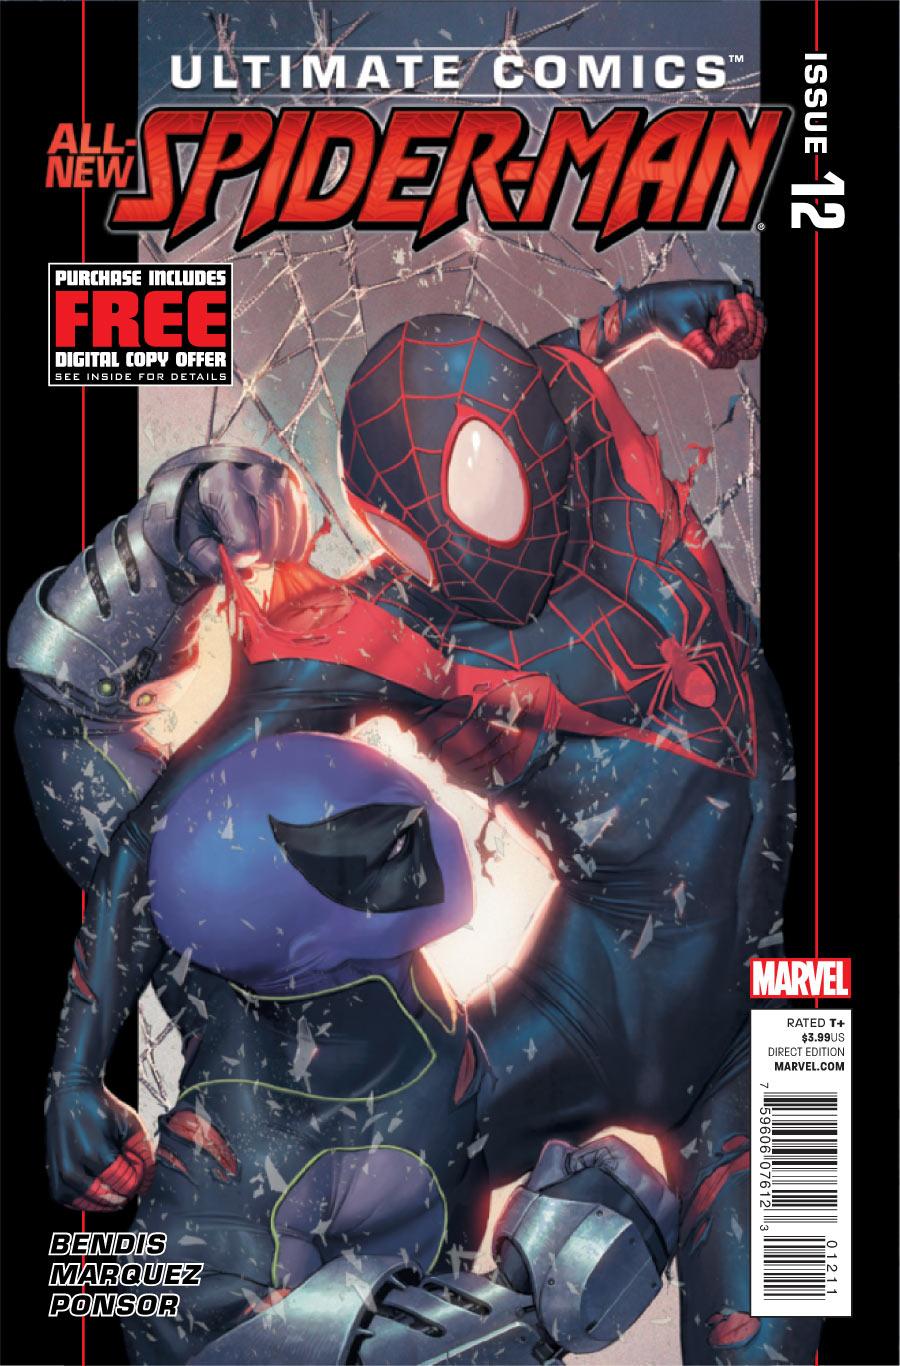 Ultimate comics spider man vol 1 12 marvel comics database - Marvel spiderman comics pdf ...